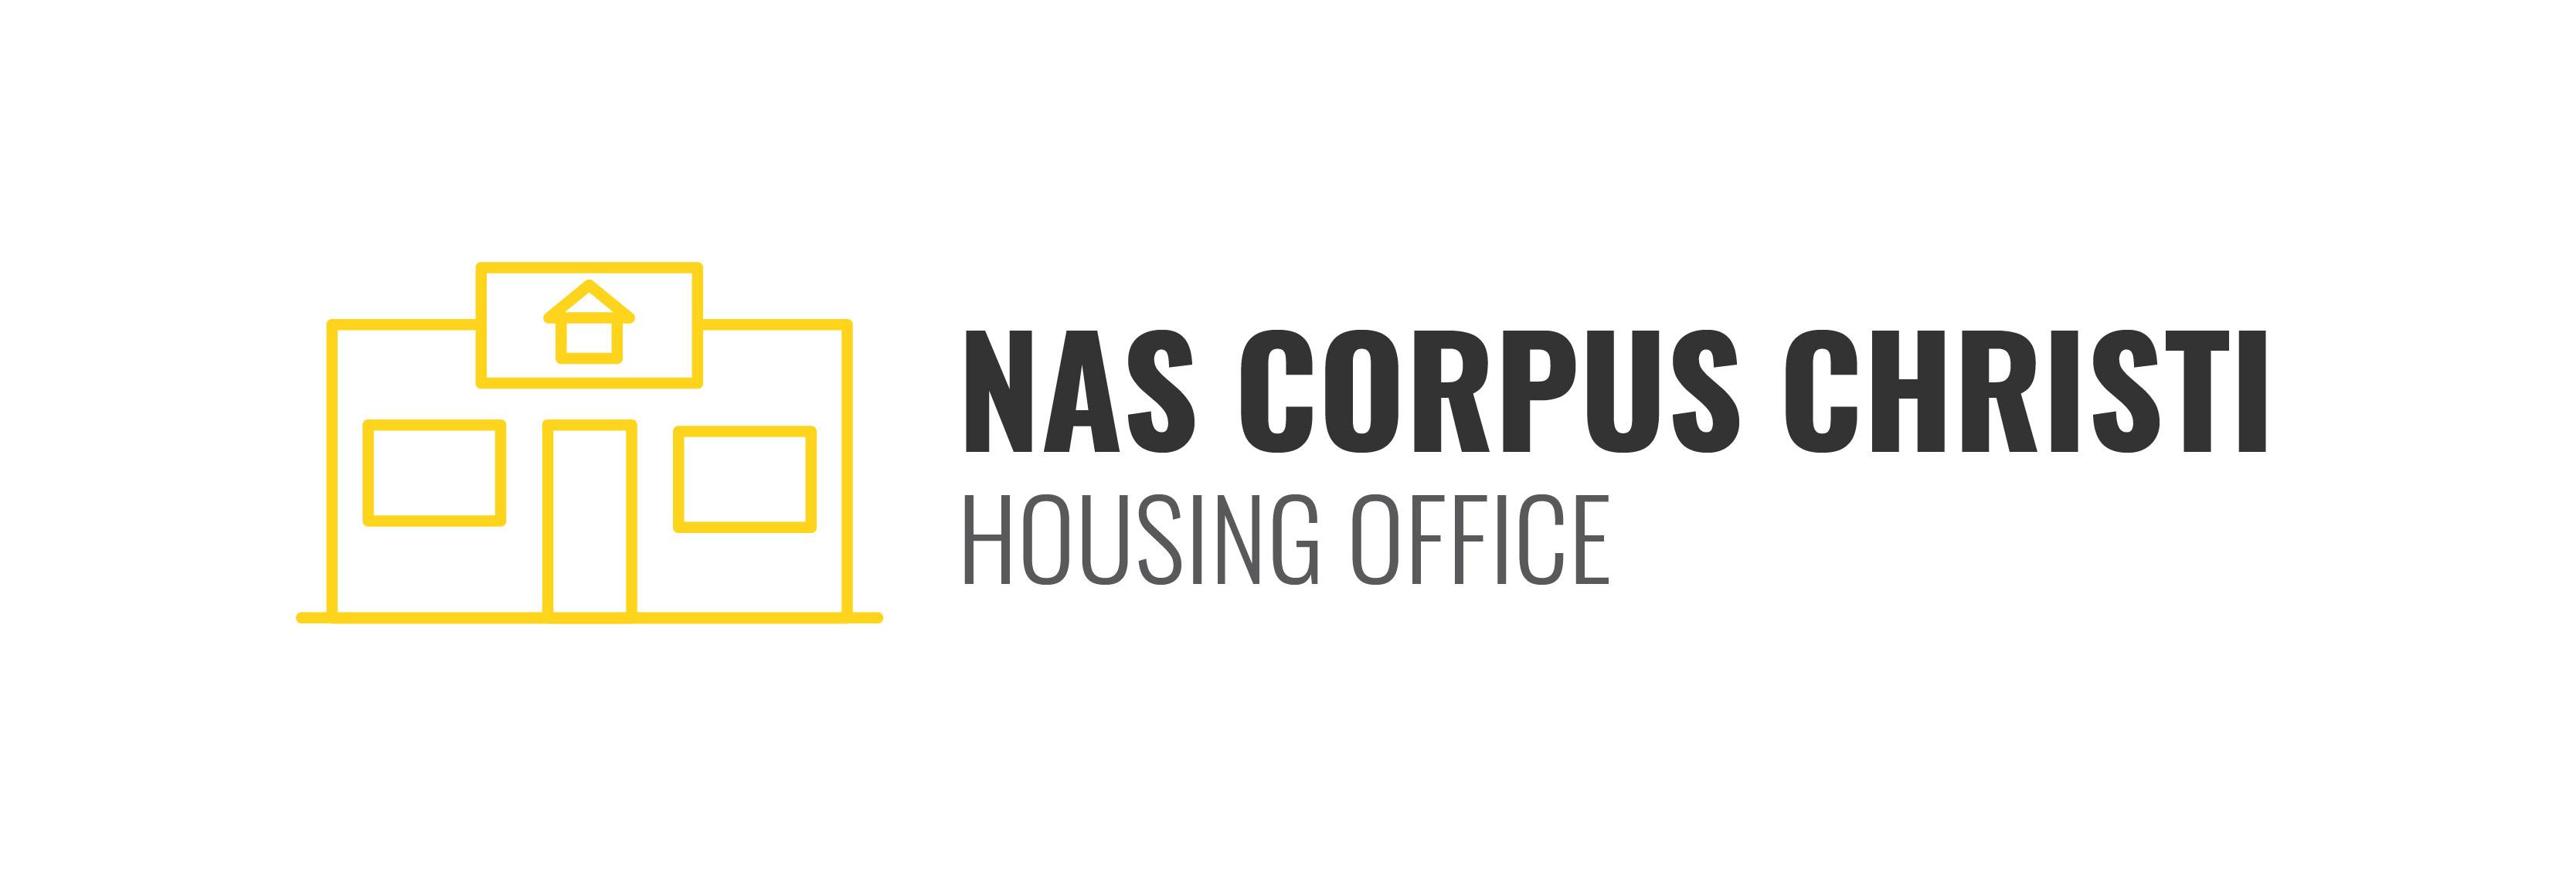 NAS Corpus Christi Housing Office